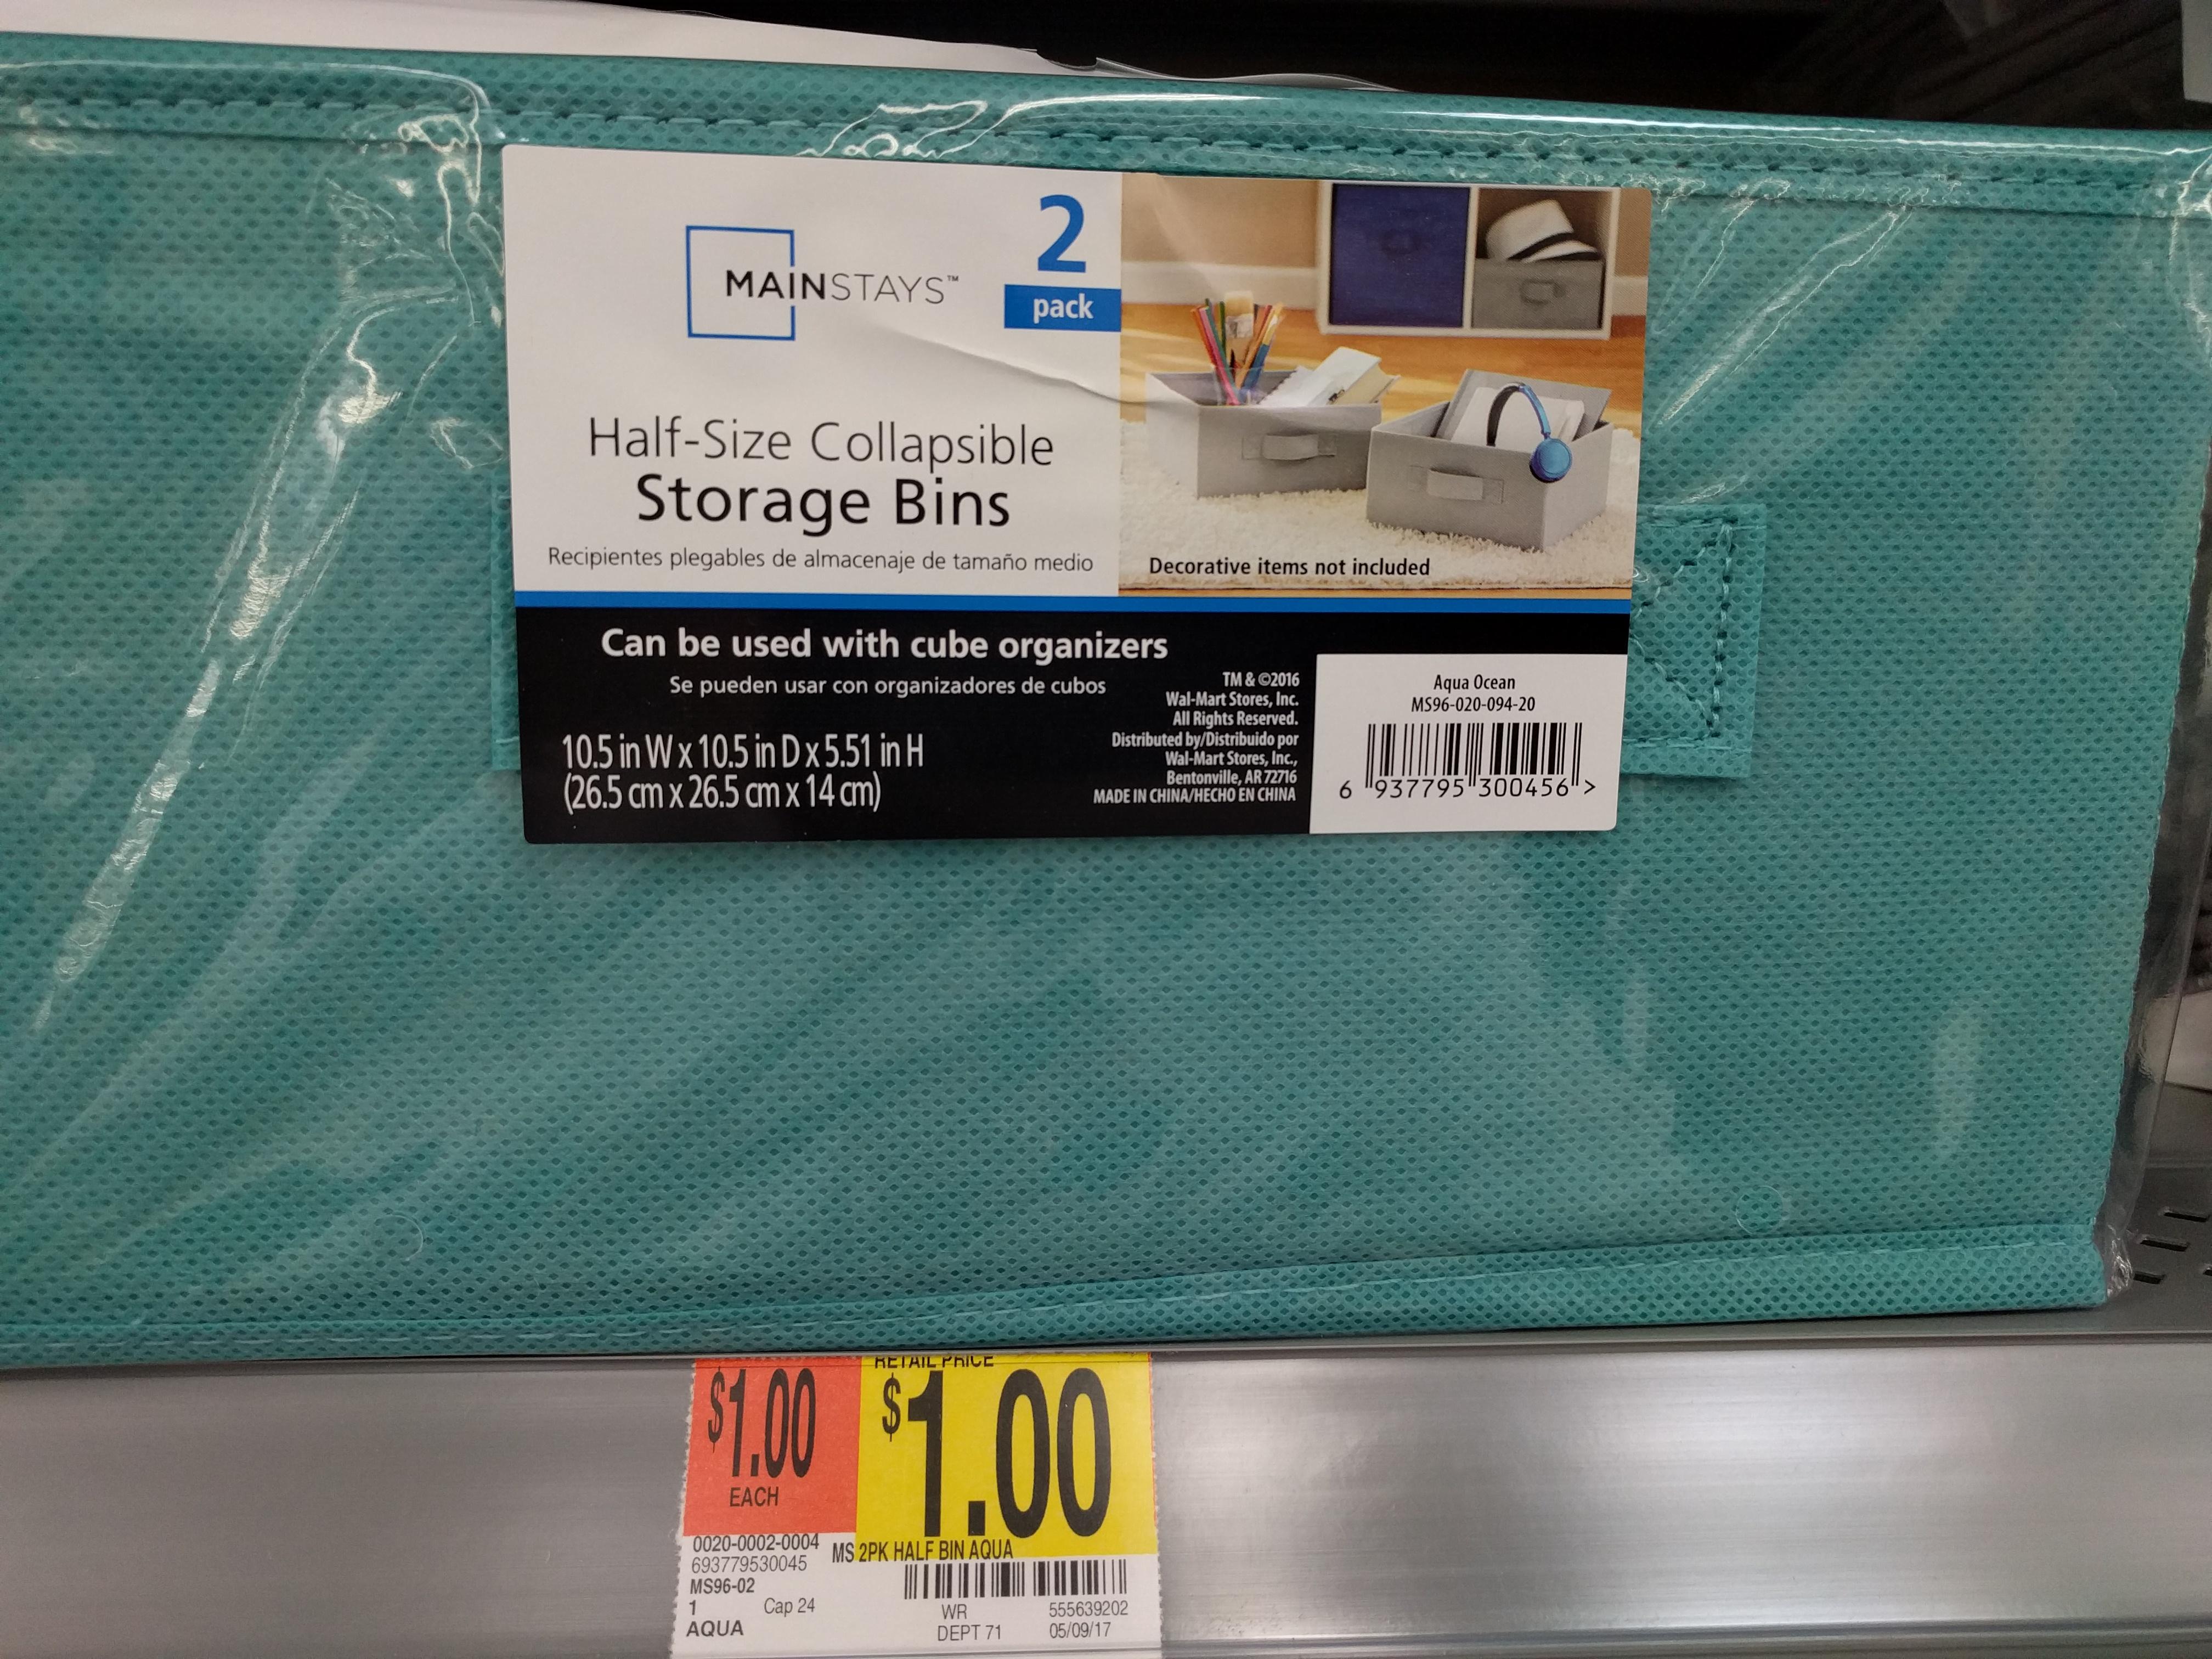 $1.00 Mainstays 2 pack Half Bin Storage Aqua Ocean @ Walmart In Store Only YMMV